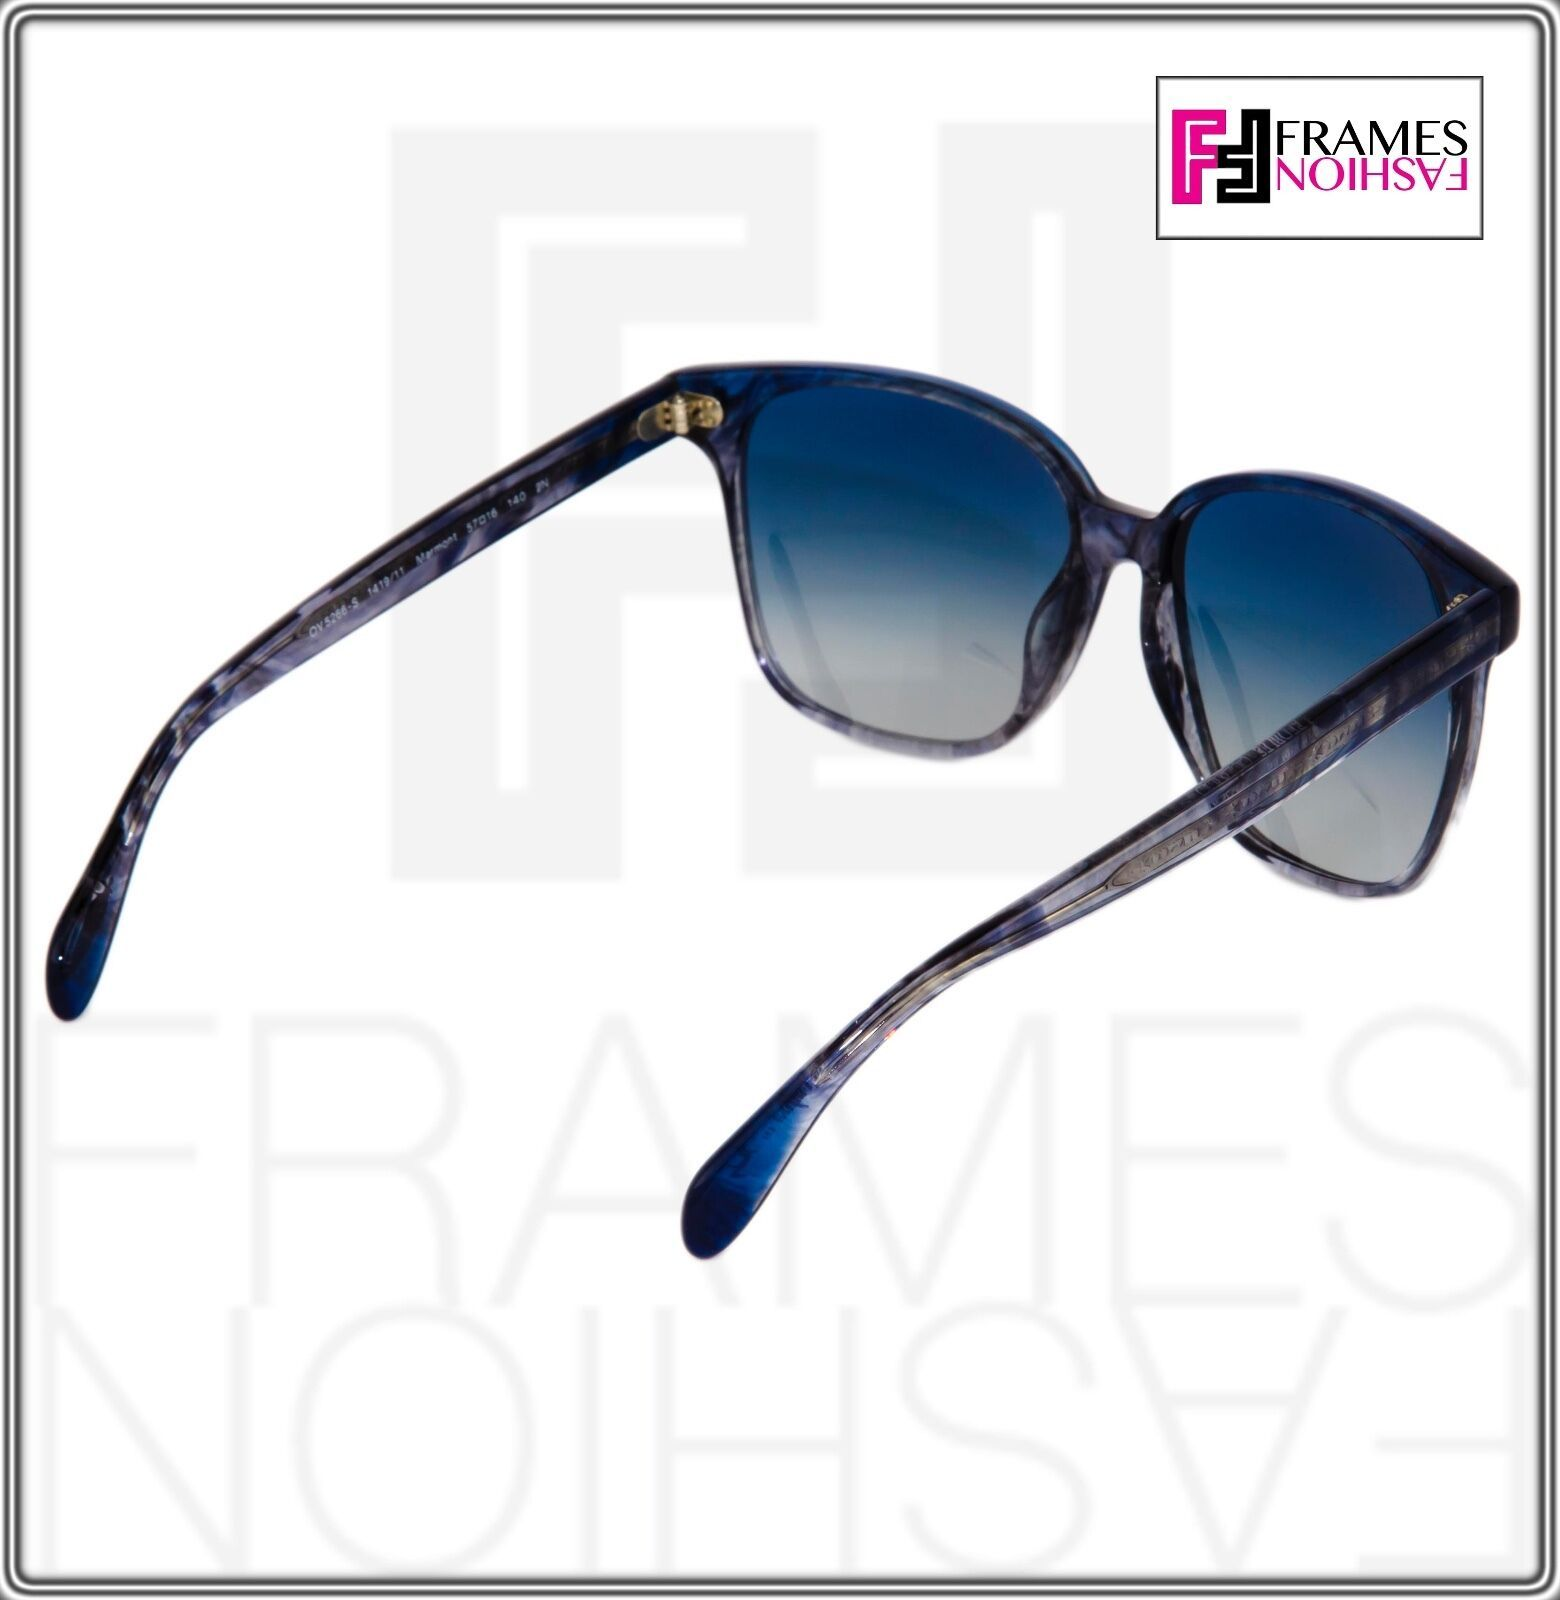 OLIVER PEOPLES MARMOT Square OV5266S Faded Sea Pacific Blue Sunglasses 5266 image 6